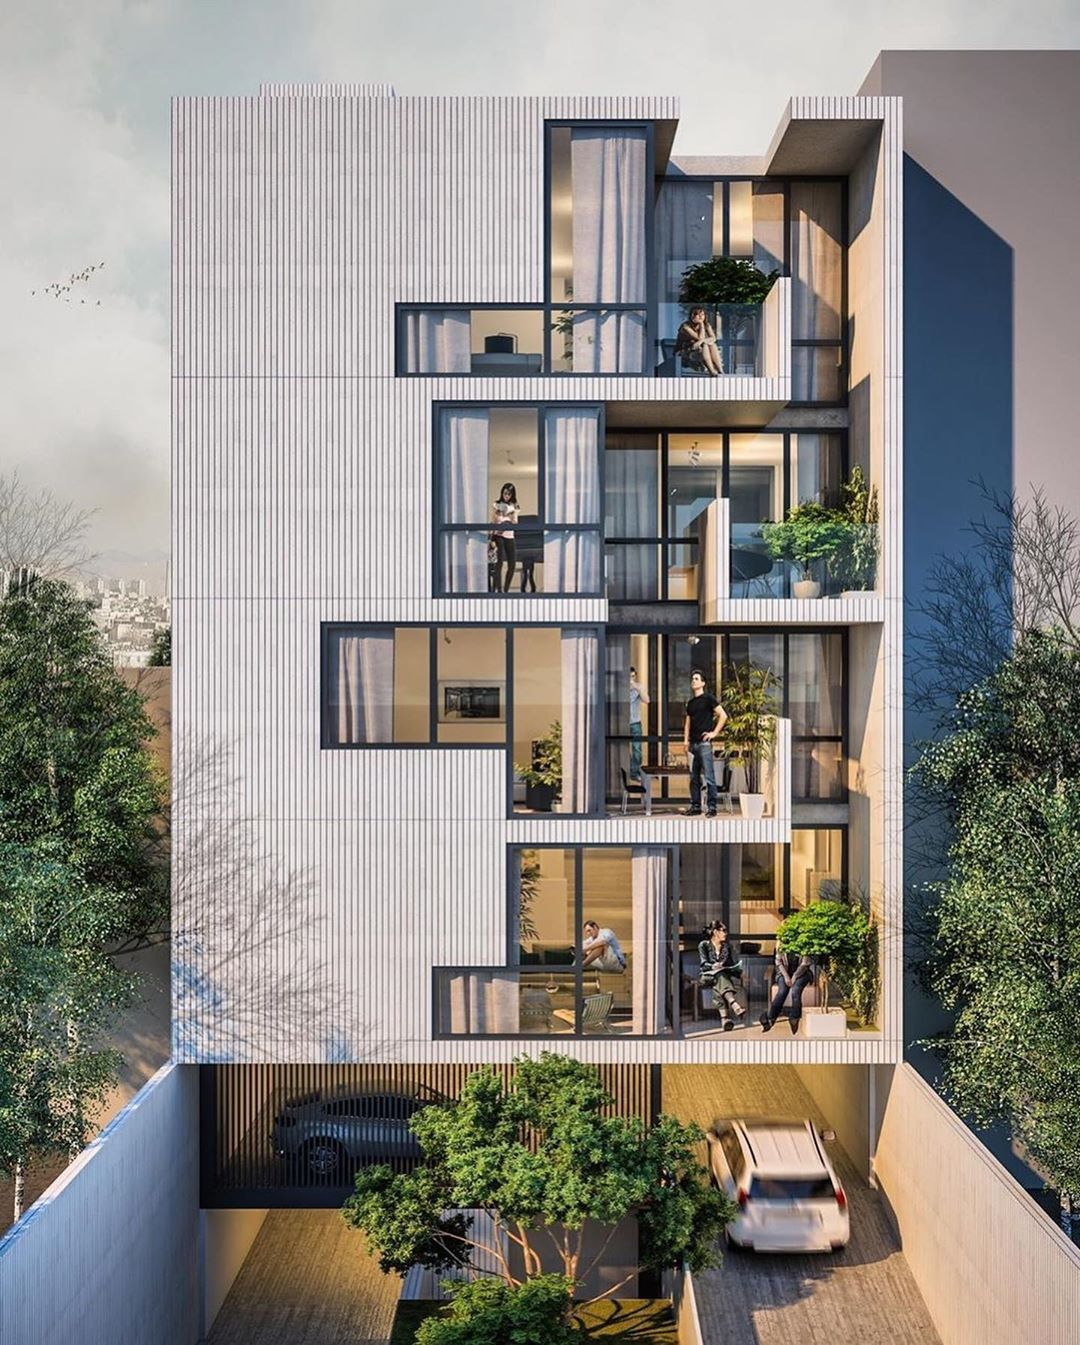 "architecture.com on Instagram: ""Gol Afshan Residence (facade study), designed by @alrzsh Visualized by @mohammad_reza_hoorjandi  #archidesign #urban #architect…"""